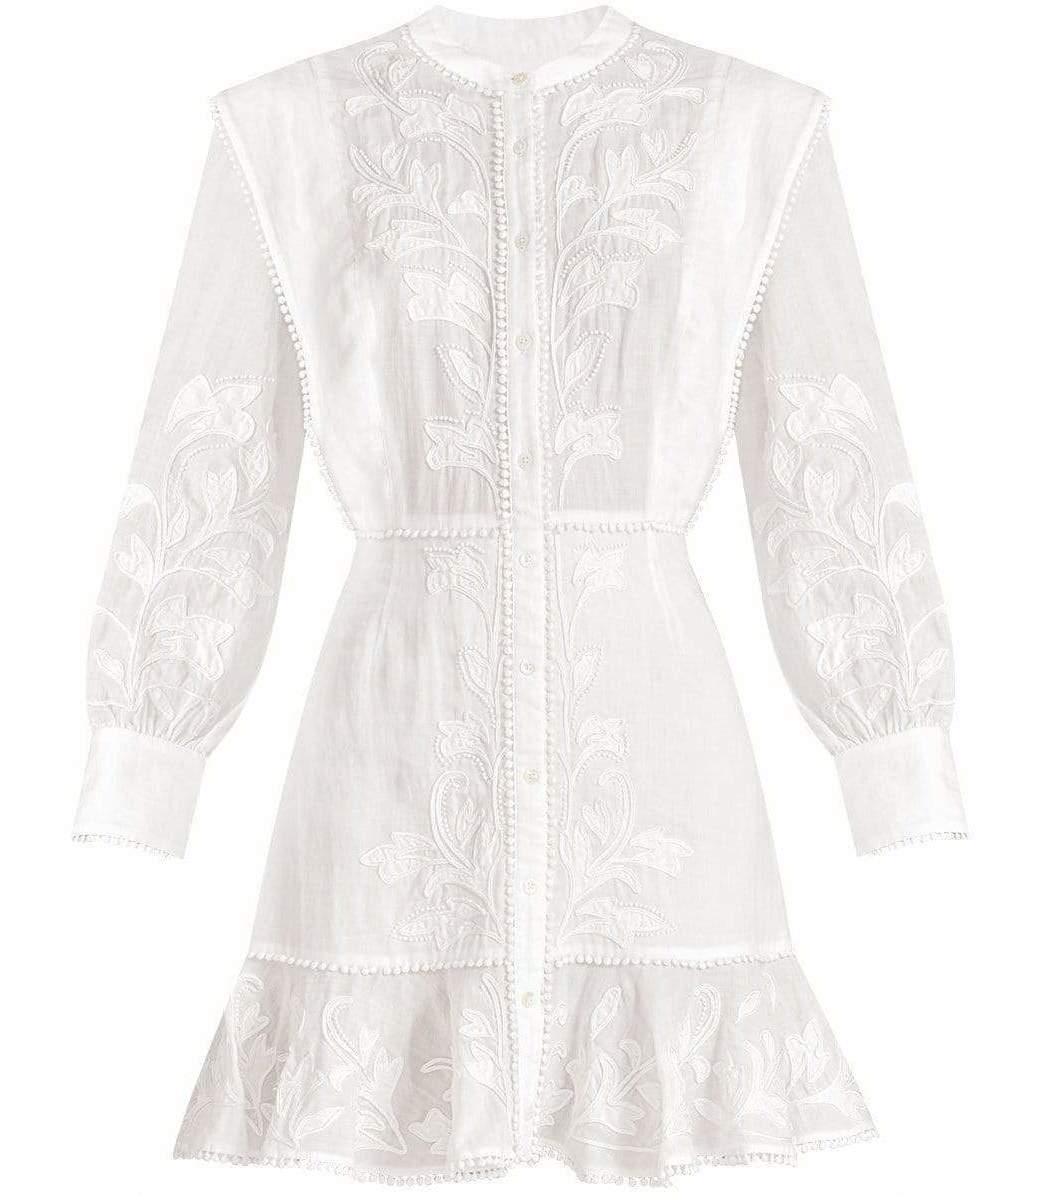 Veronica Beard Dresses White Analeah Embroidered Minidress